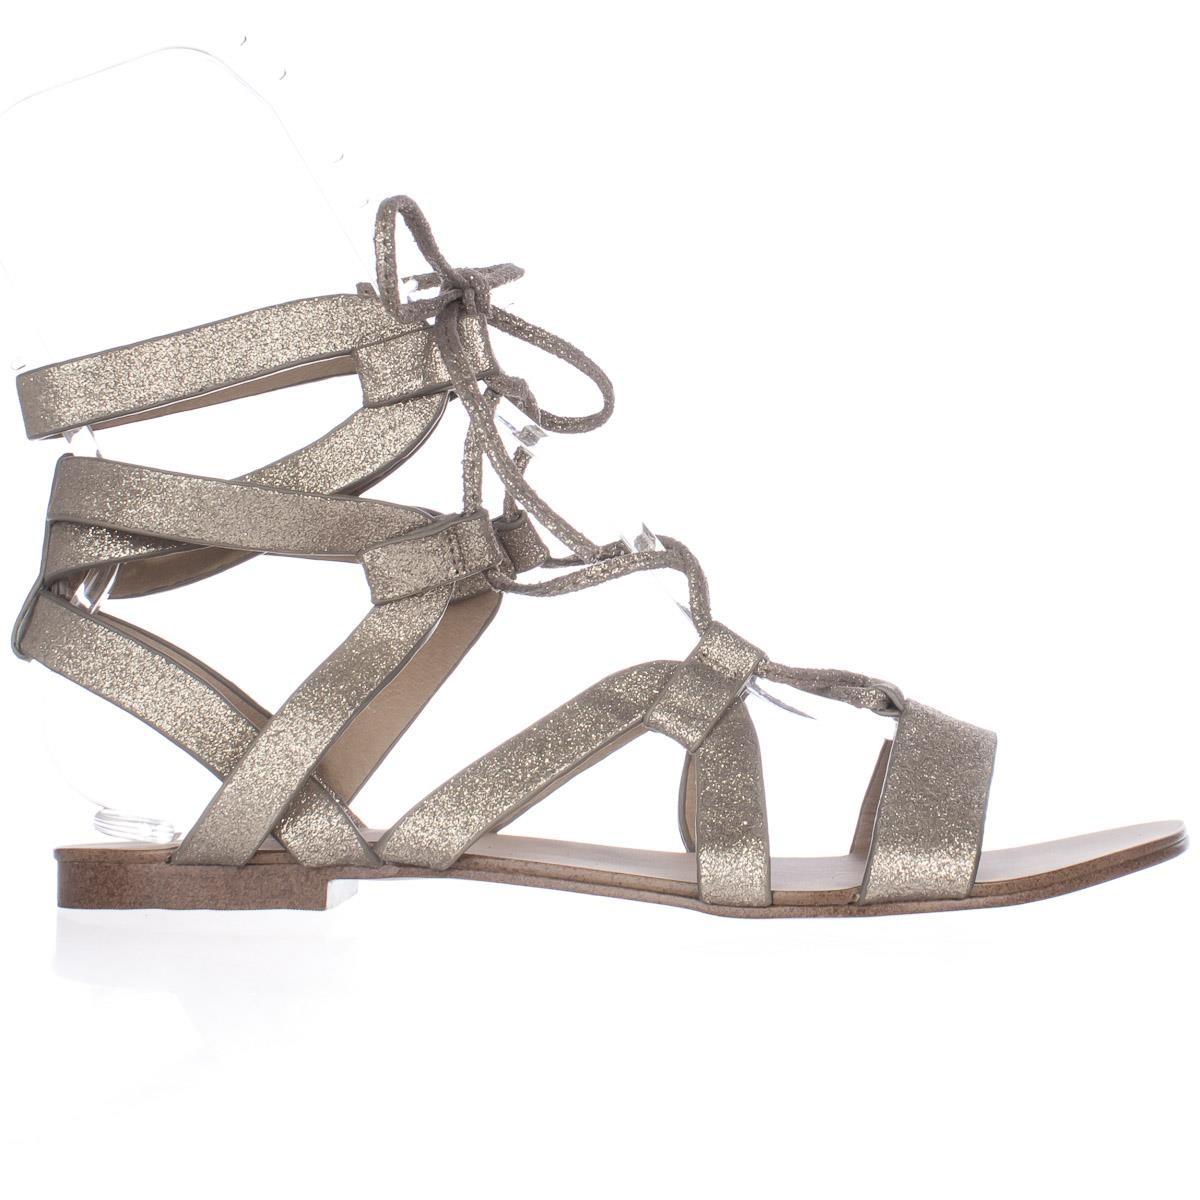 d5277f861b12 Splendid Cameron Gladiator Sandals - Champagne